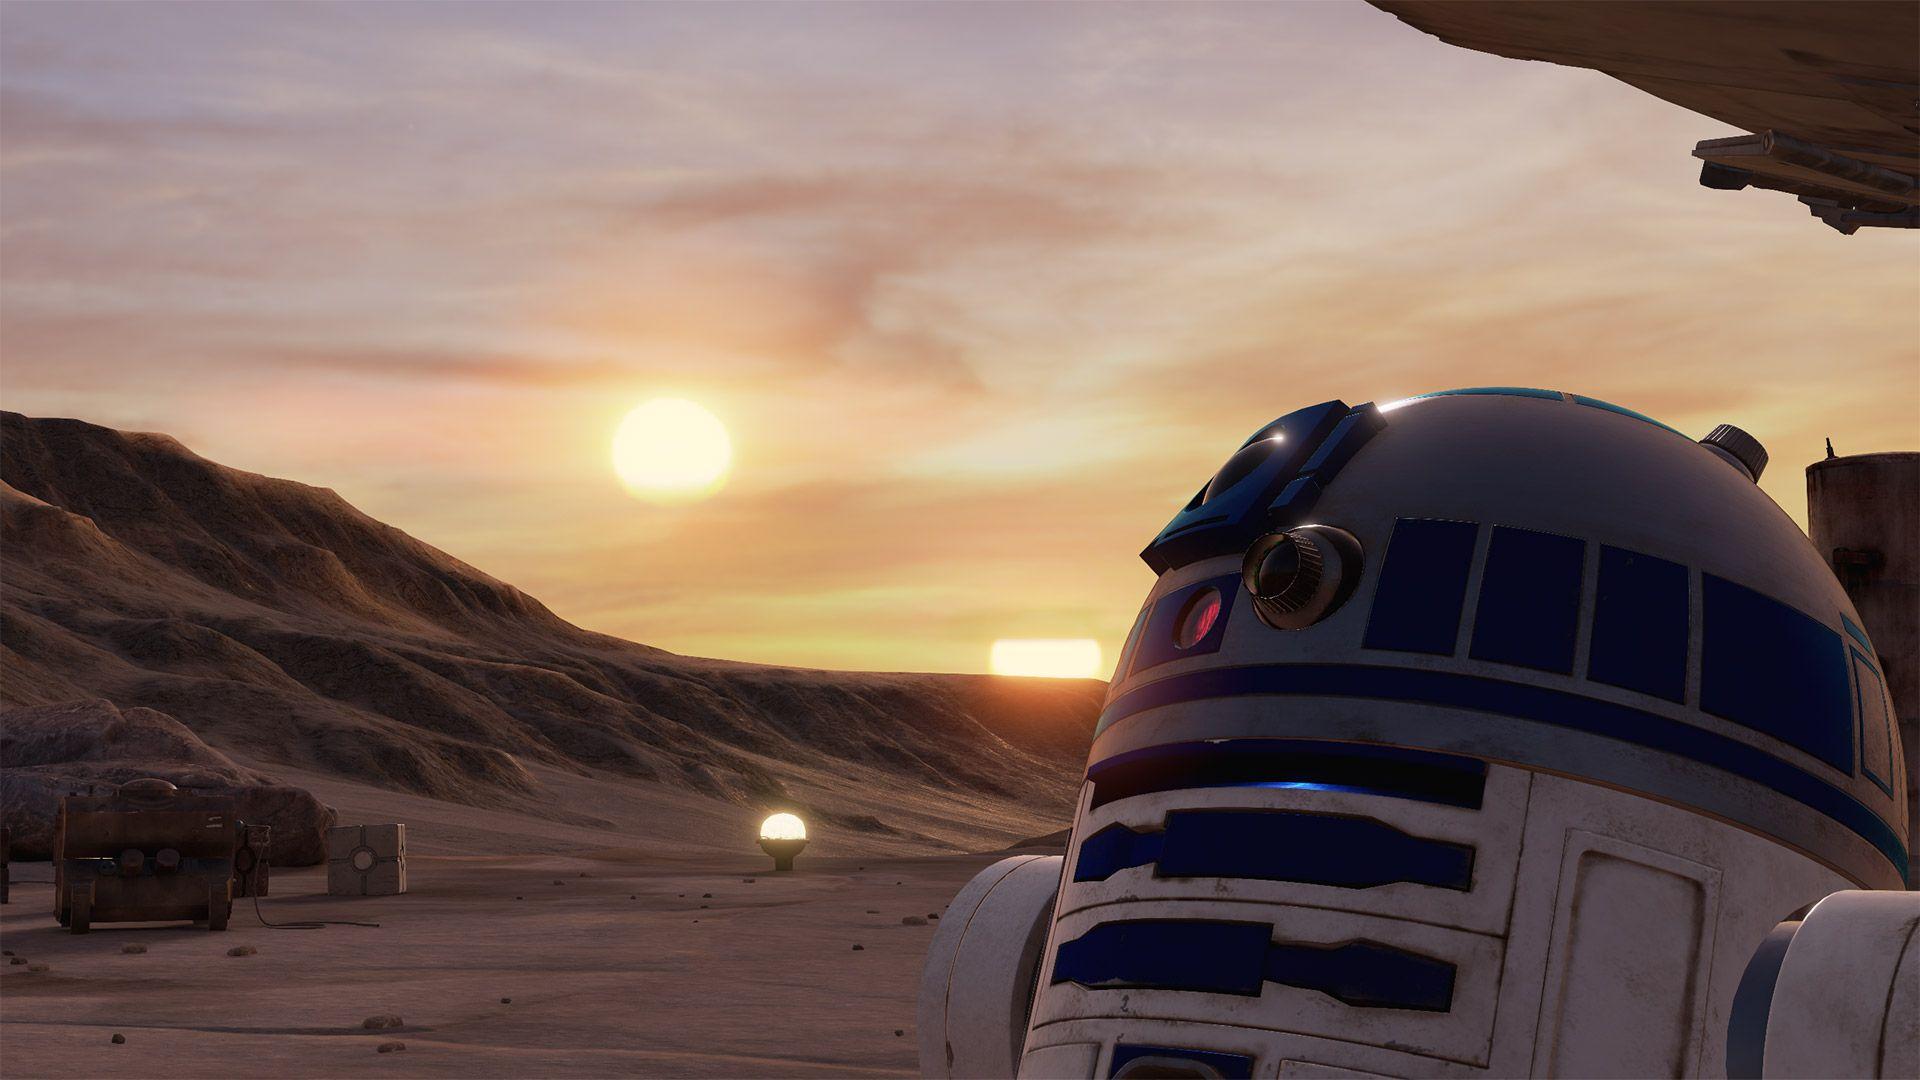 Star Wars is exploring virtual reality